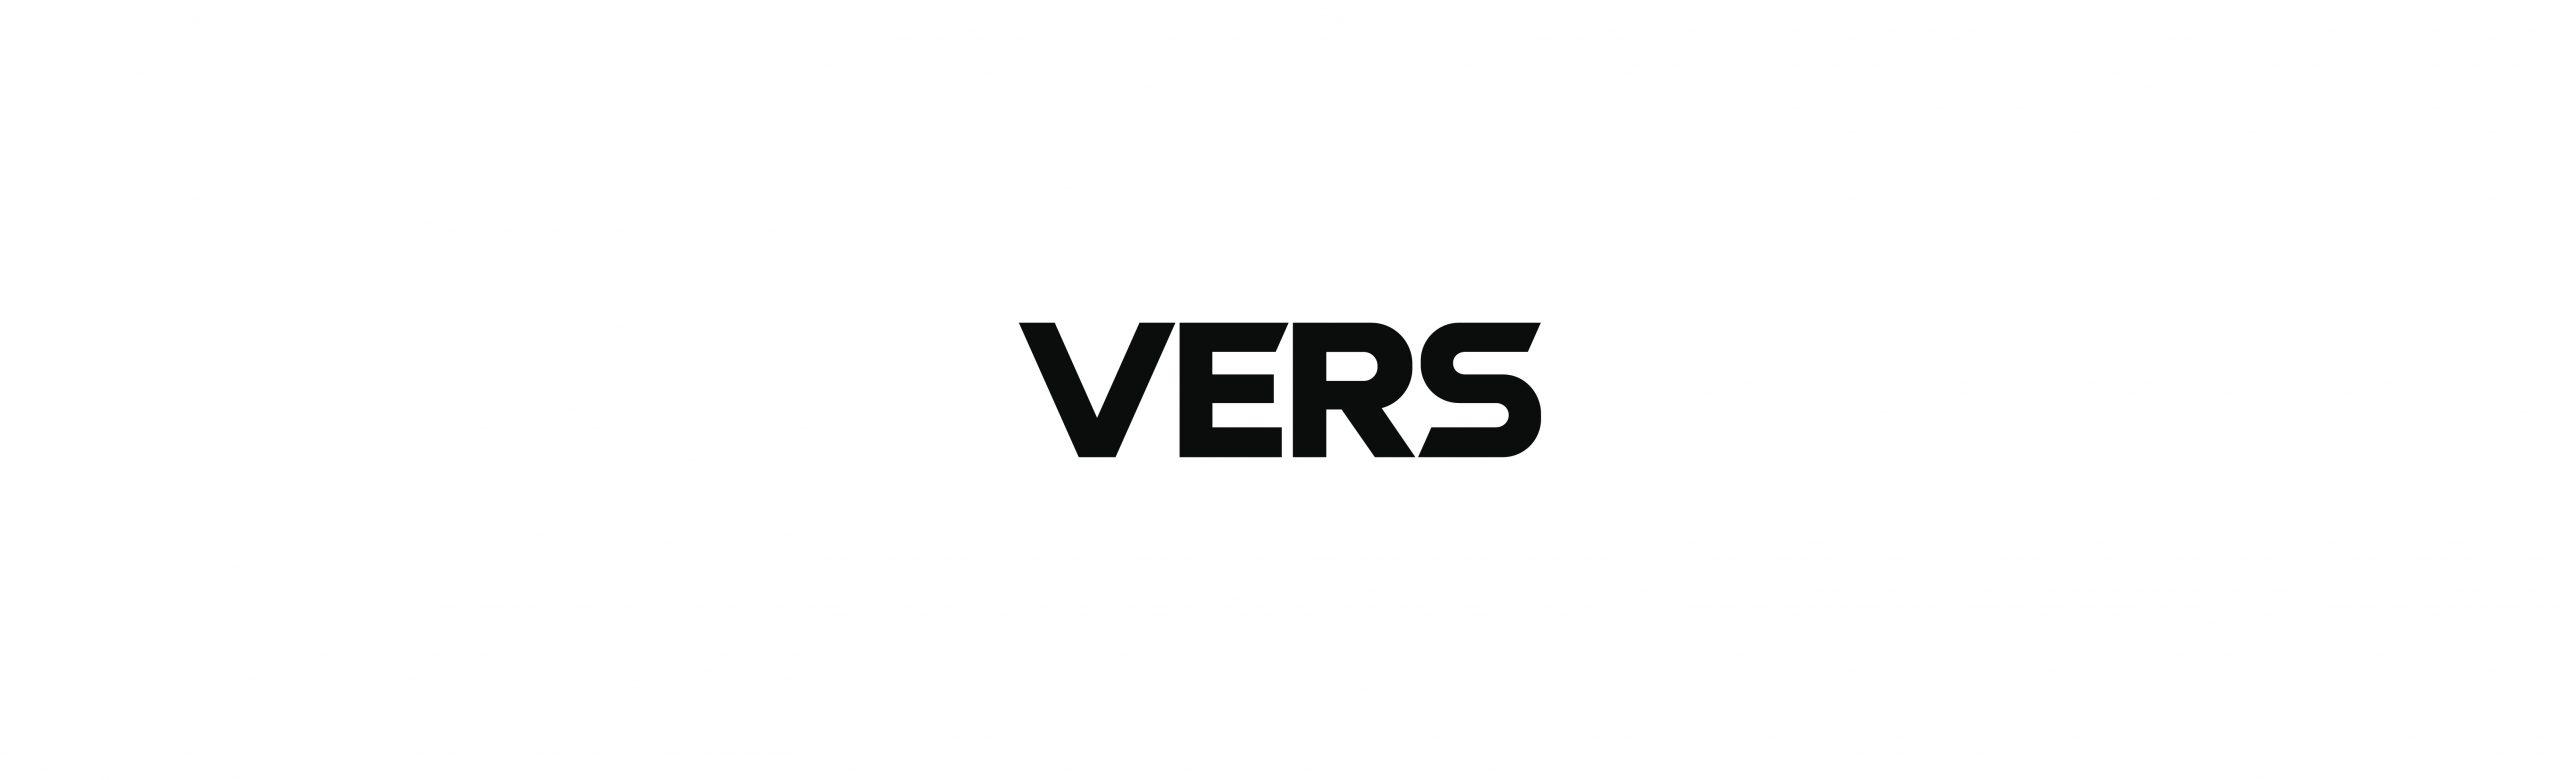 Logo VERS Rebranding